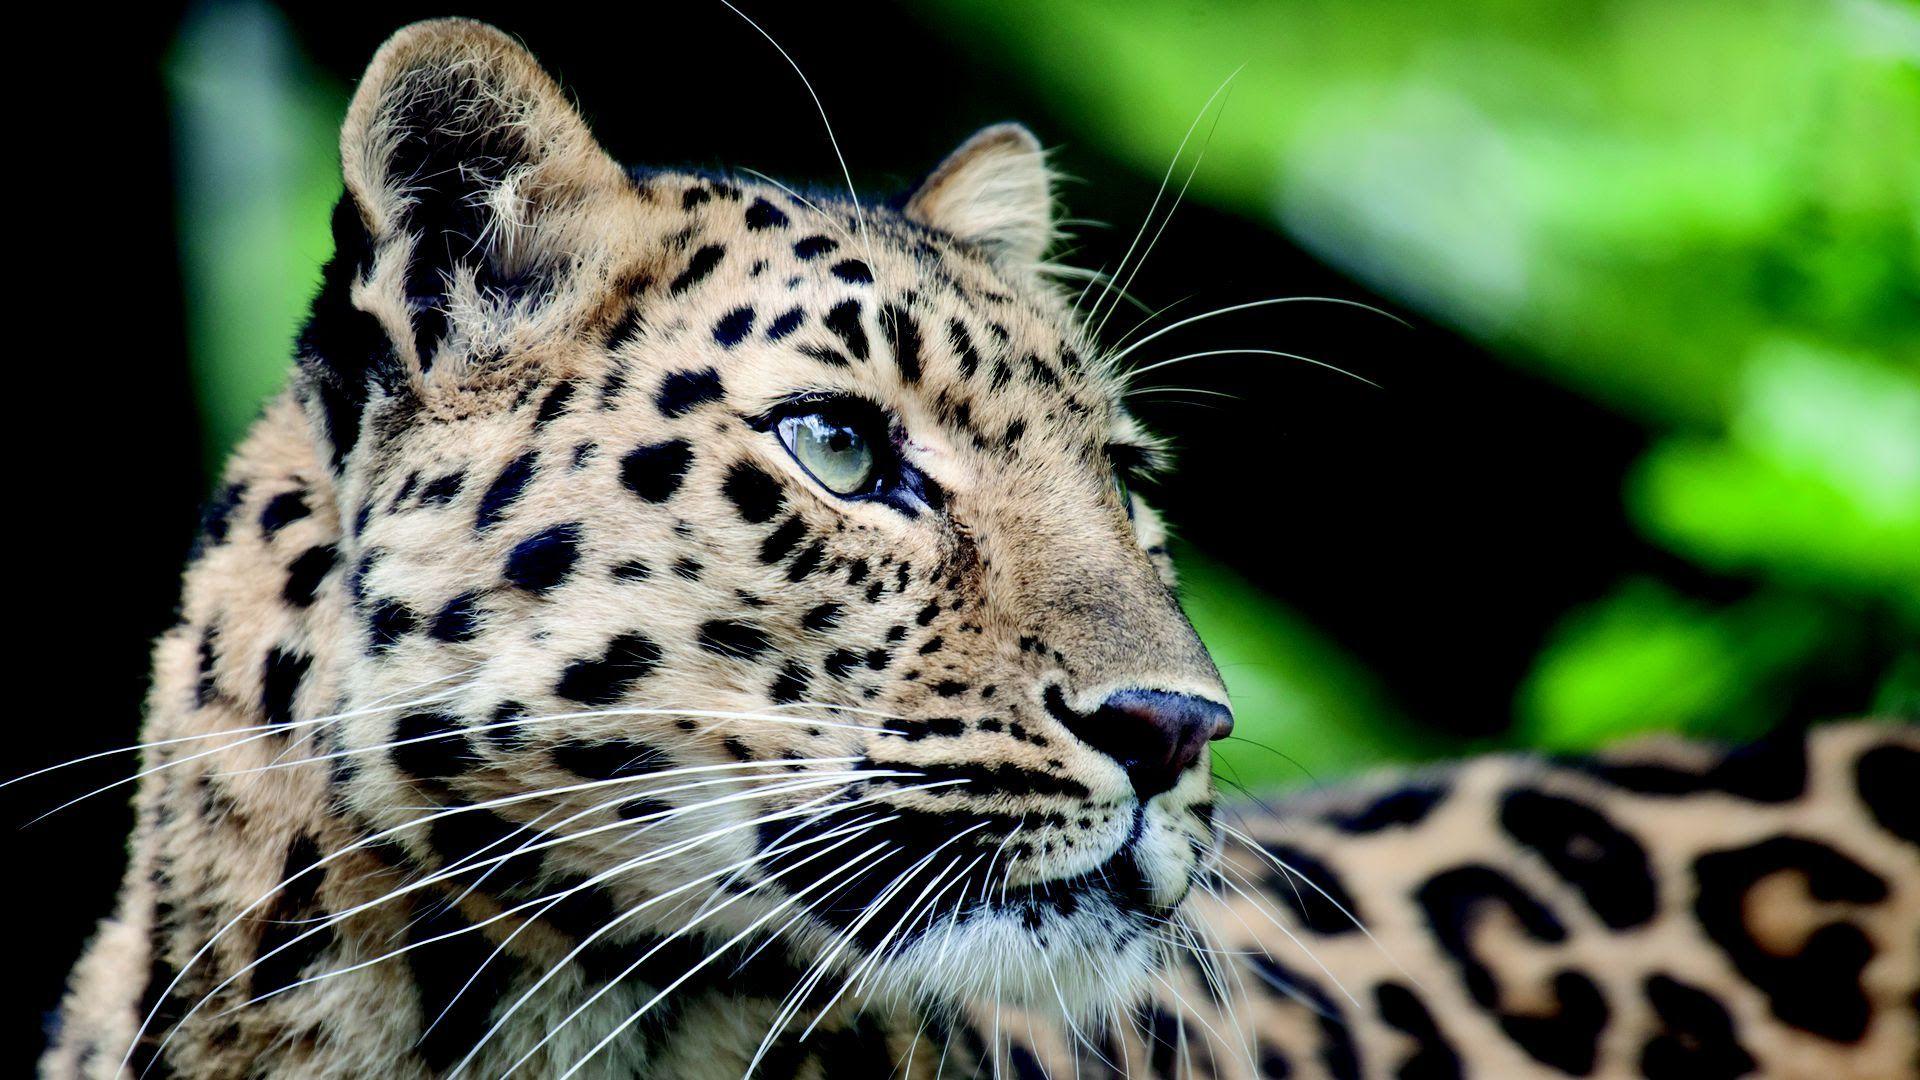 A Jaguar at the Nashville Zoo.